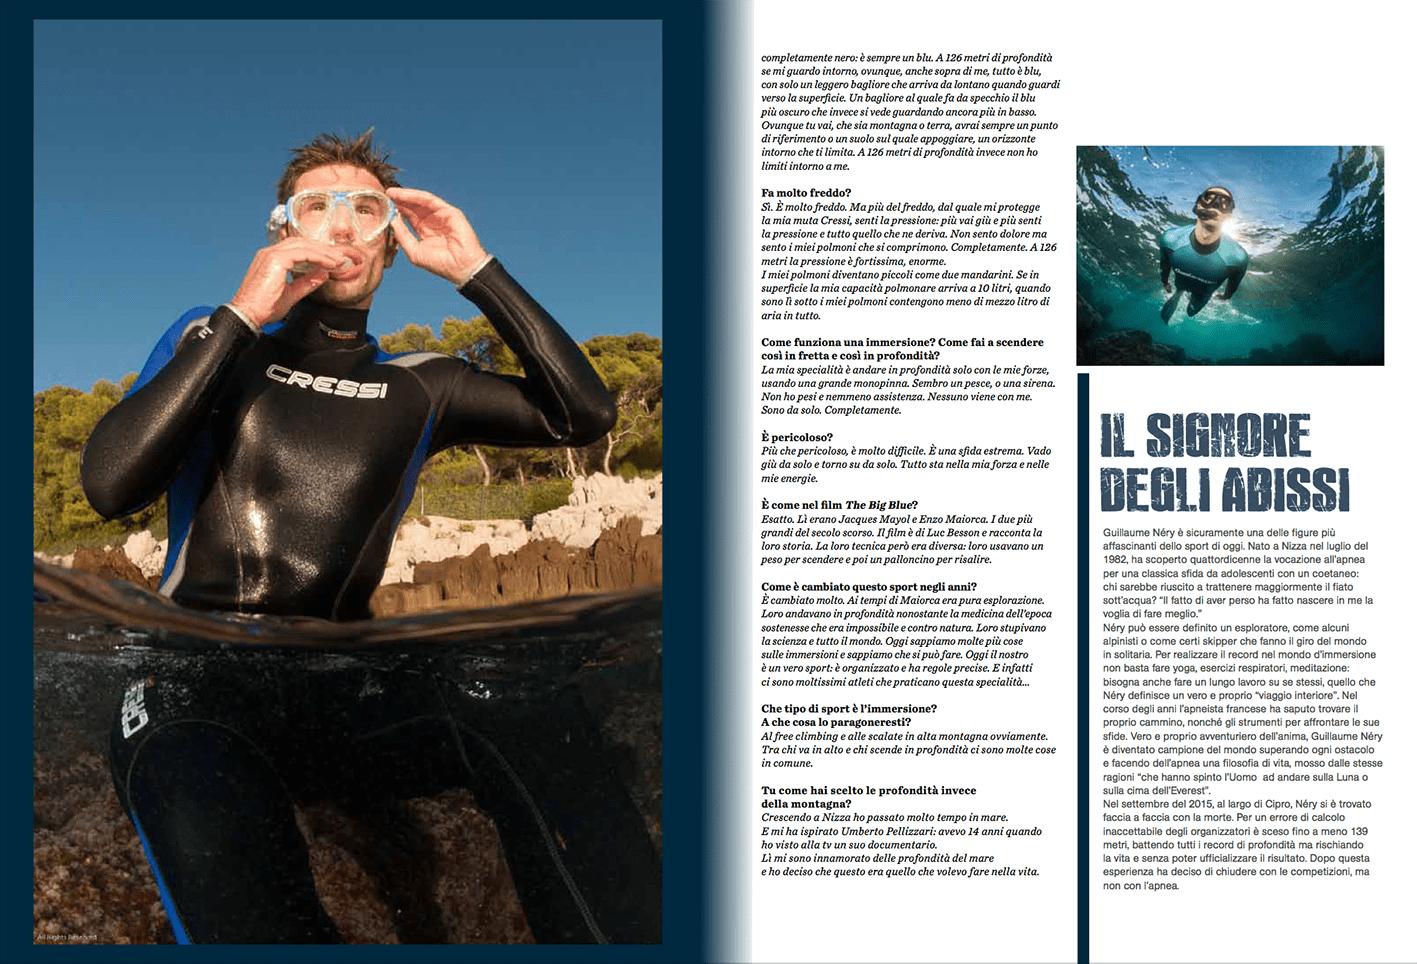 Guillaume Nery, men'shealth, magazine, italy, diving, worldchampion, Nicolas Gerardin, photography,